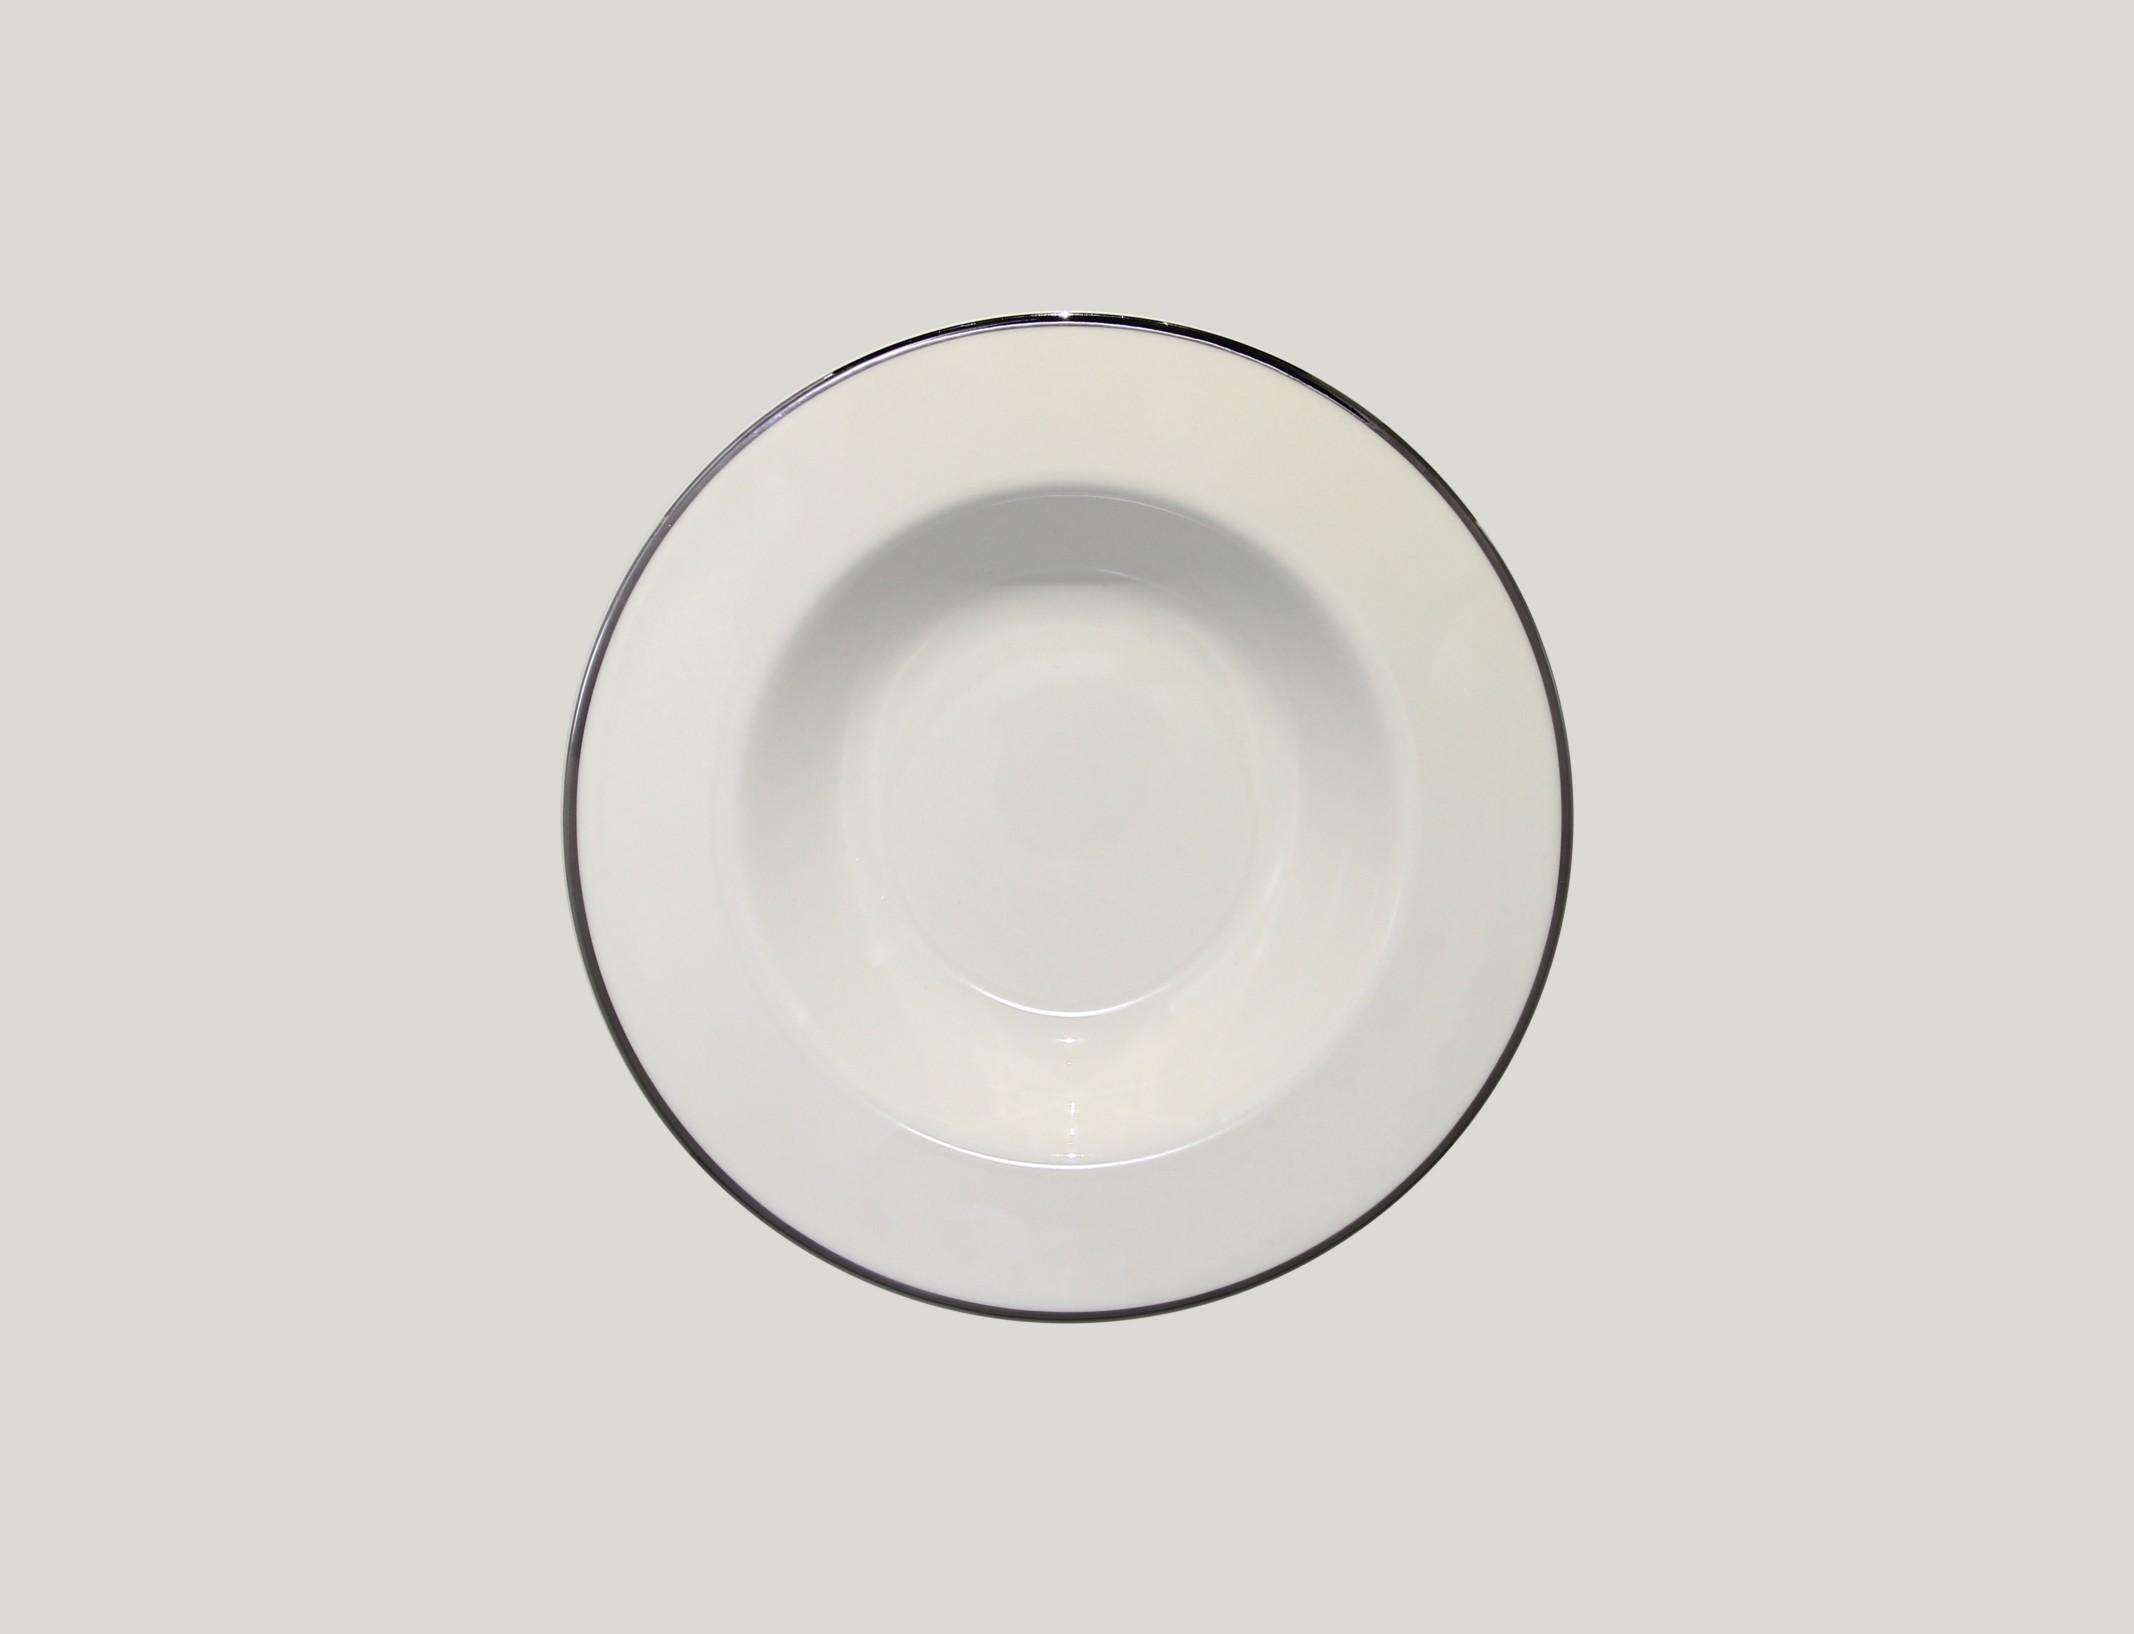 Hluboký talíř - S PLATINOVOU LINII PLATINUM